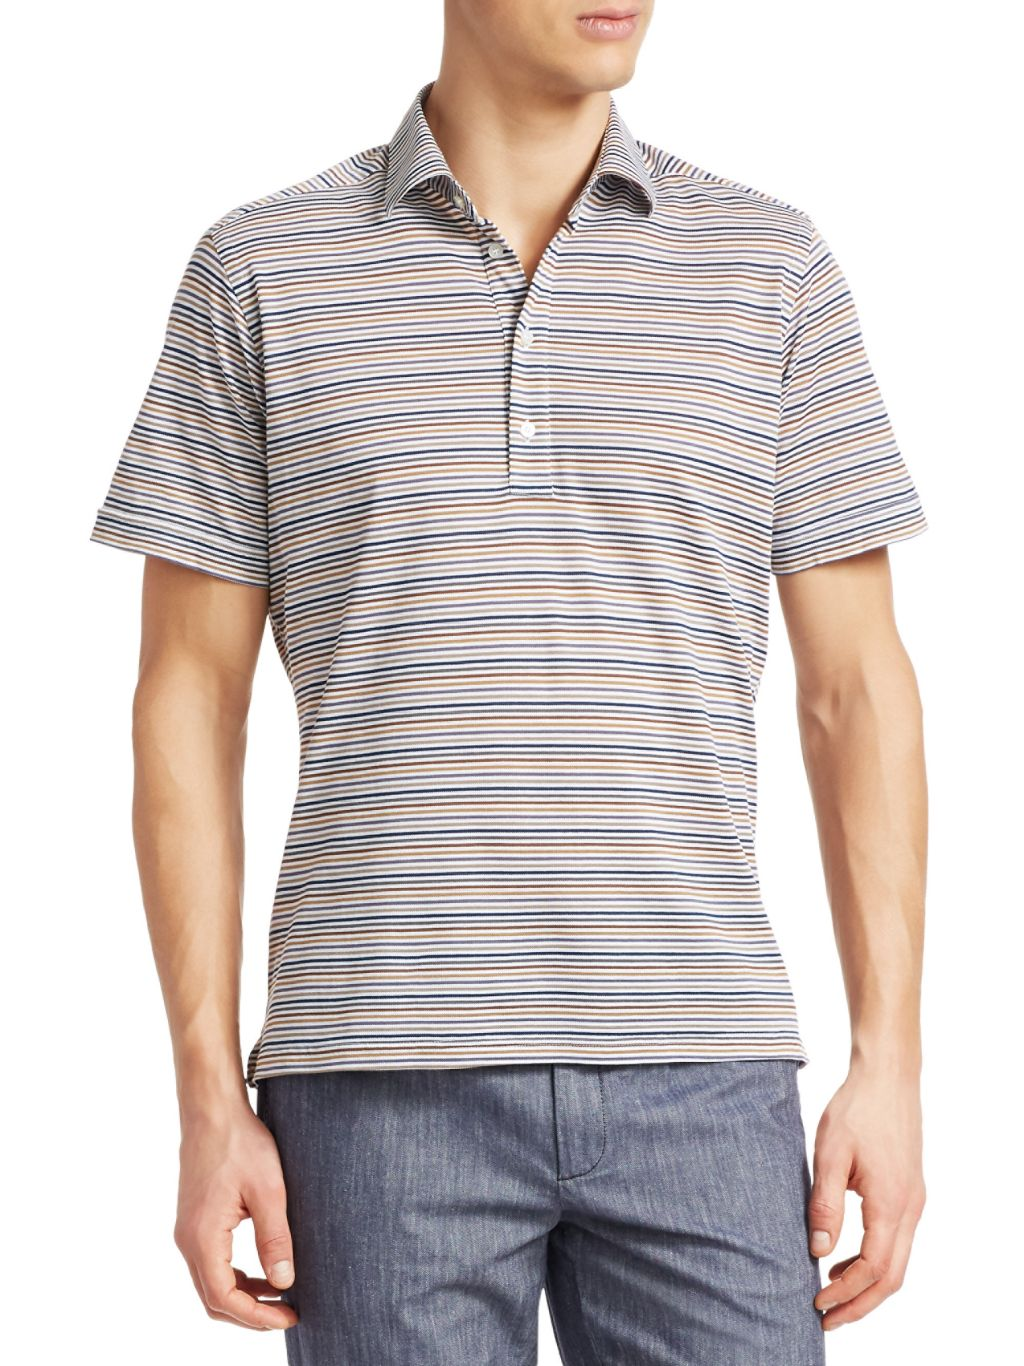 Saks Fifth Avenue COLLECTION Multi-Color Stripe Cotton Polo